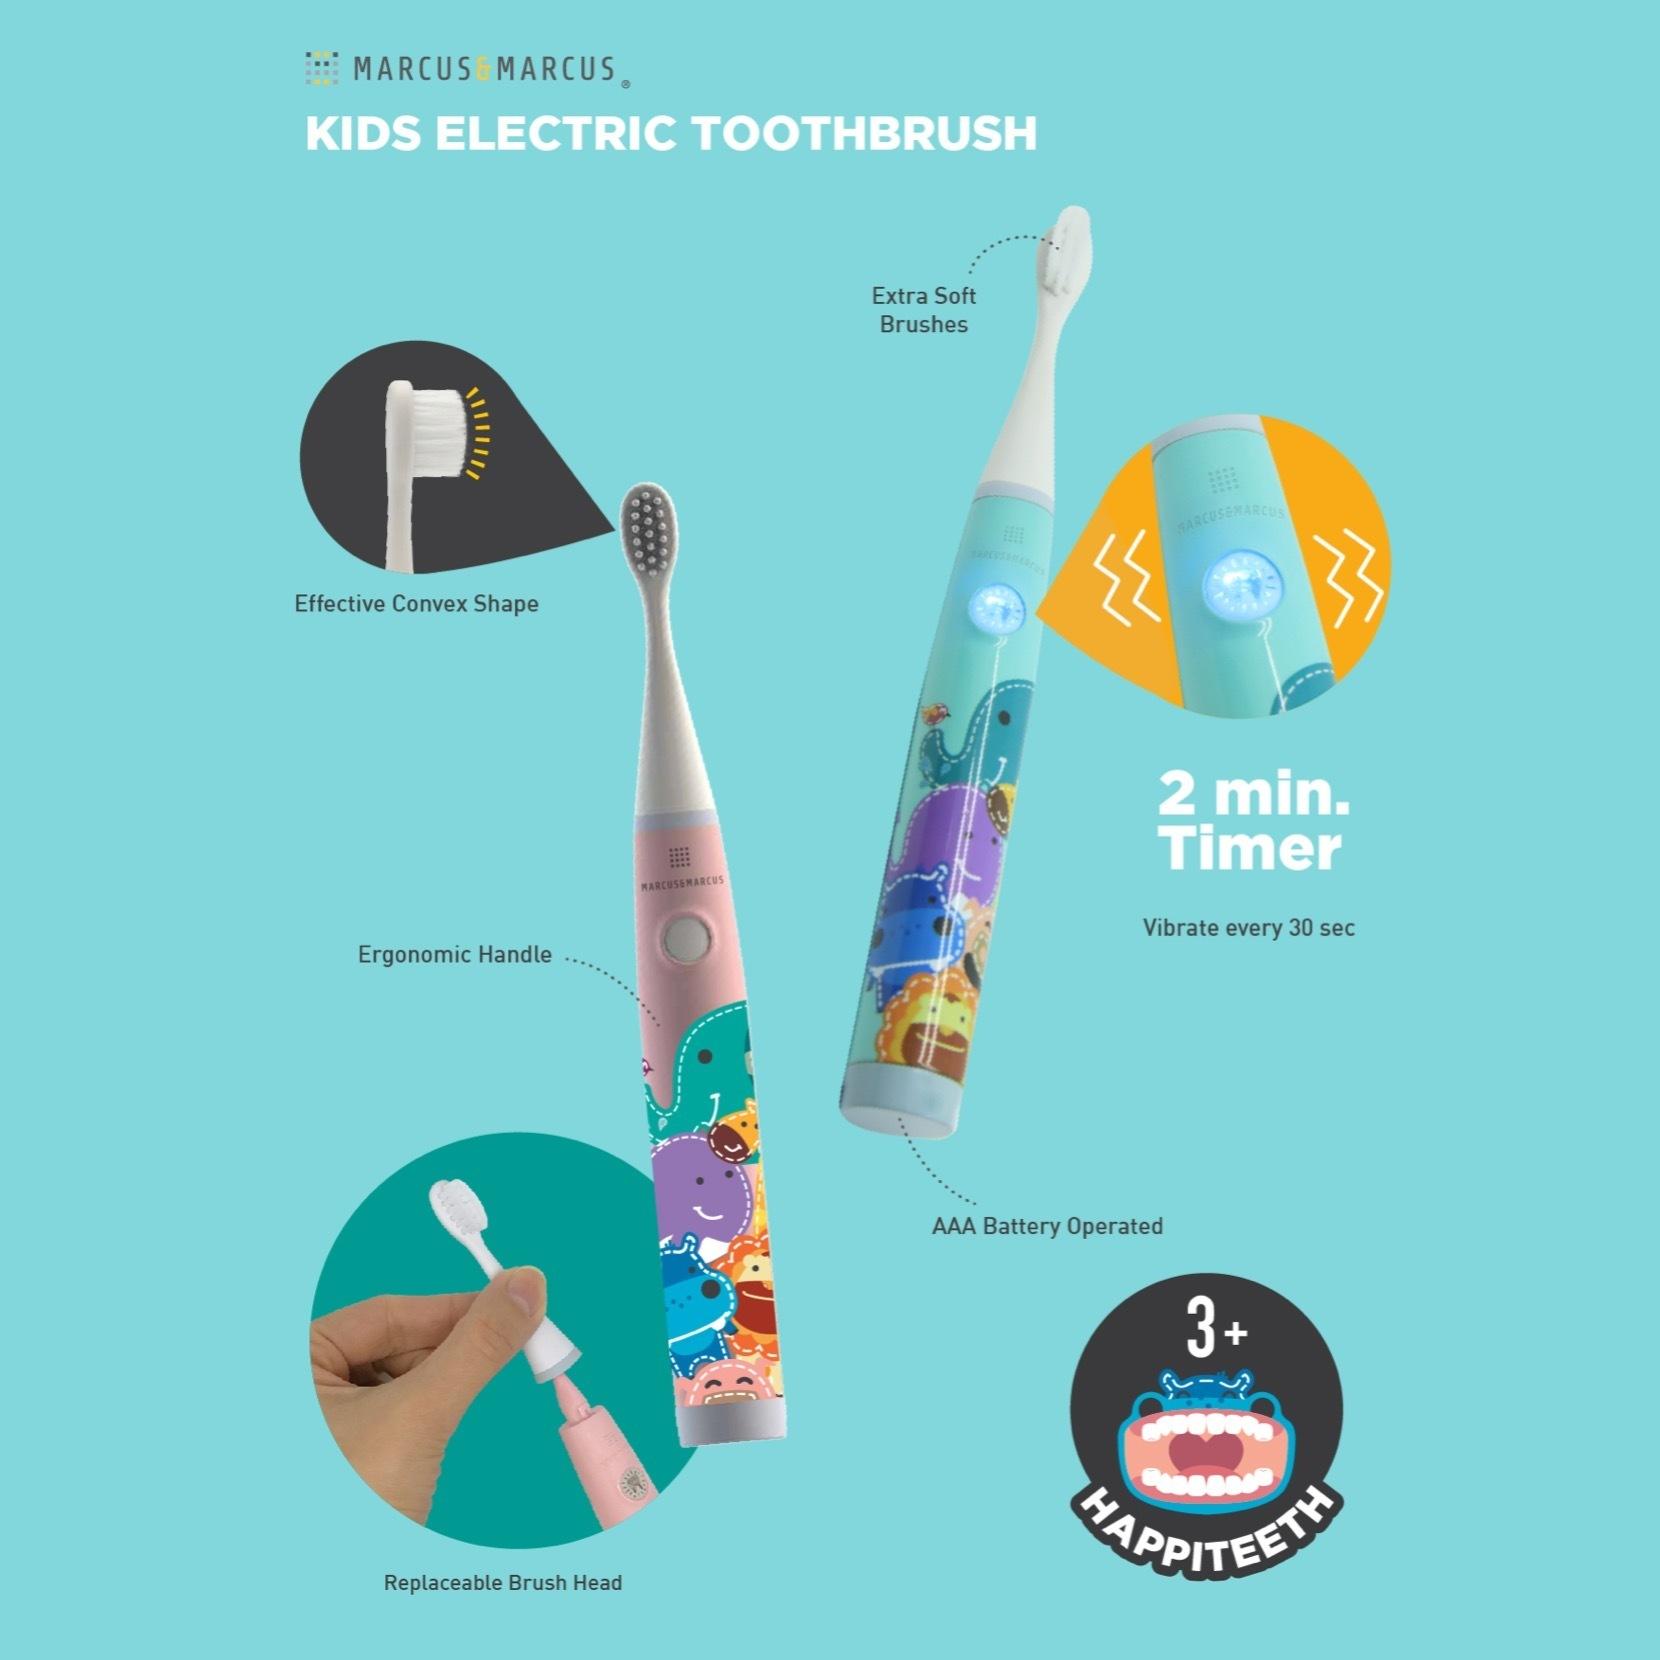 marcus and marcus kids sonic electronic toothbrush 儿童音波电动牙刷